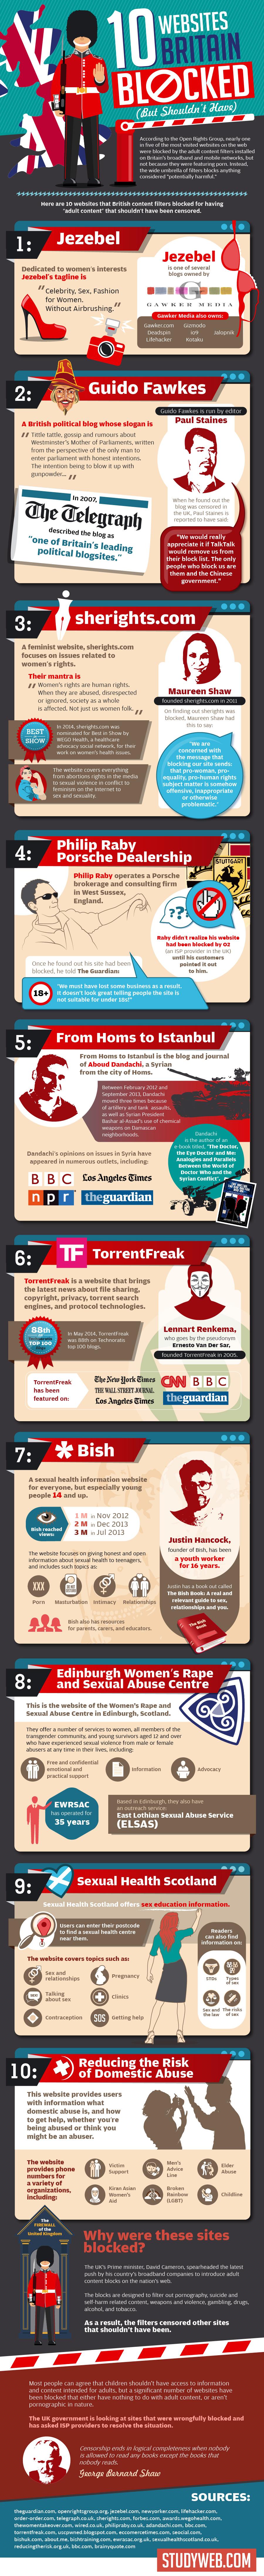 10 Websites Britain Blocked